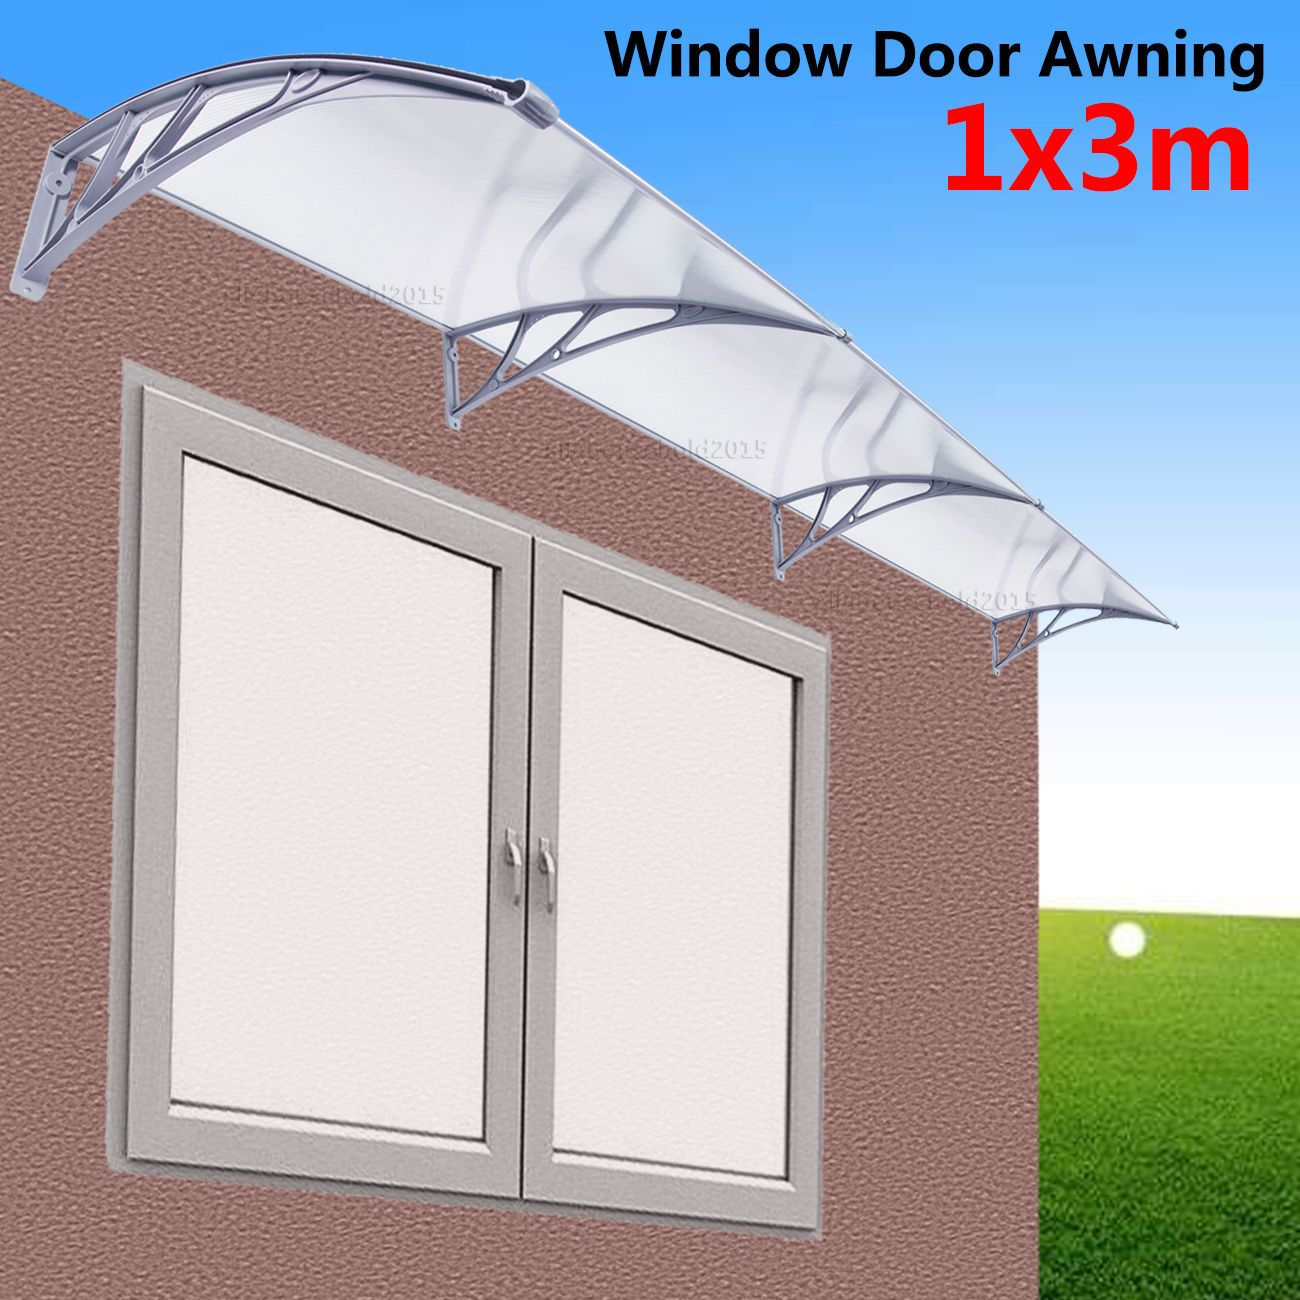 1m X 3m Diy Outdoor Window Patio Uv Rain Awning Cover Sun Shield Door Canopy Outdoor Window Awnings Canopy Outdoor Diy Outdoor